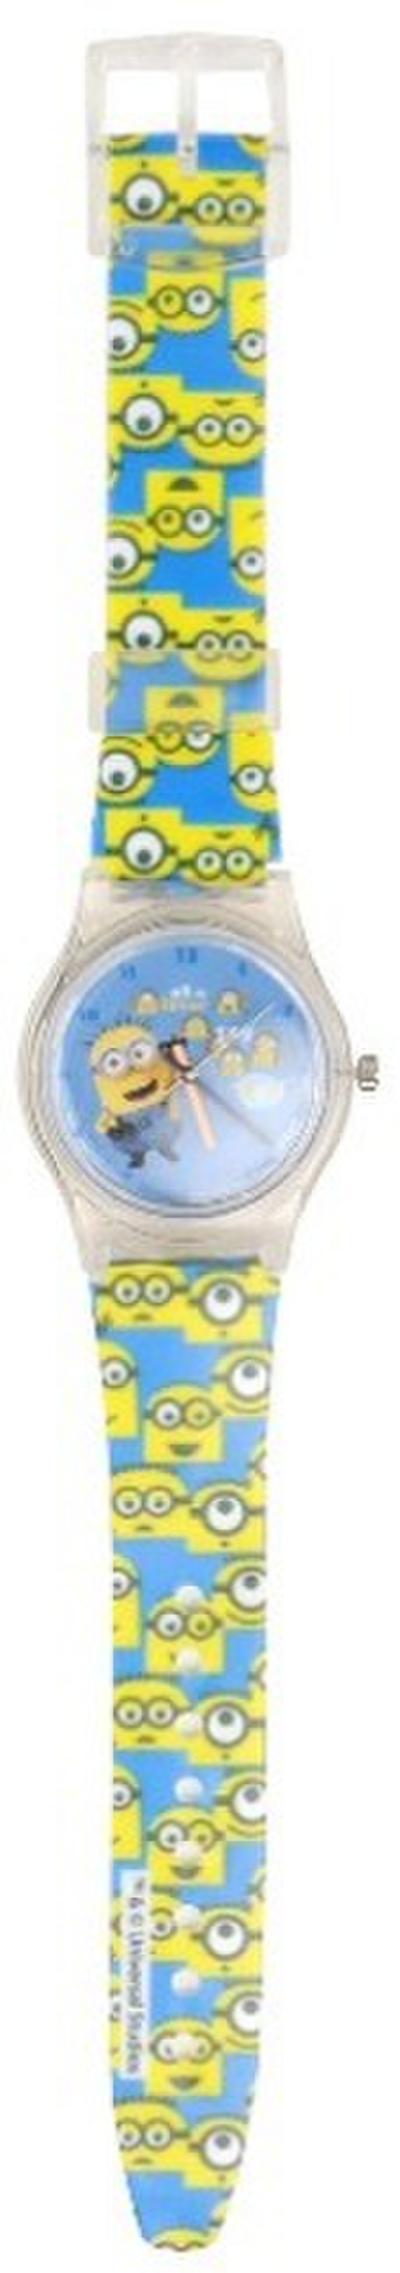 minions-armbanduhr-minions-extreme-0812247